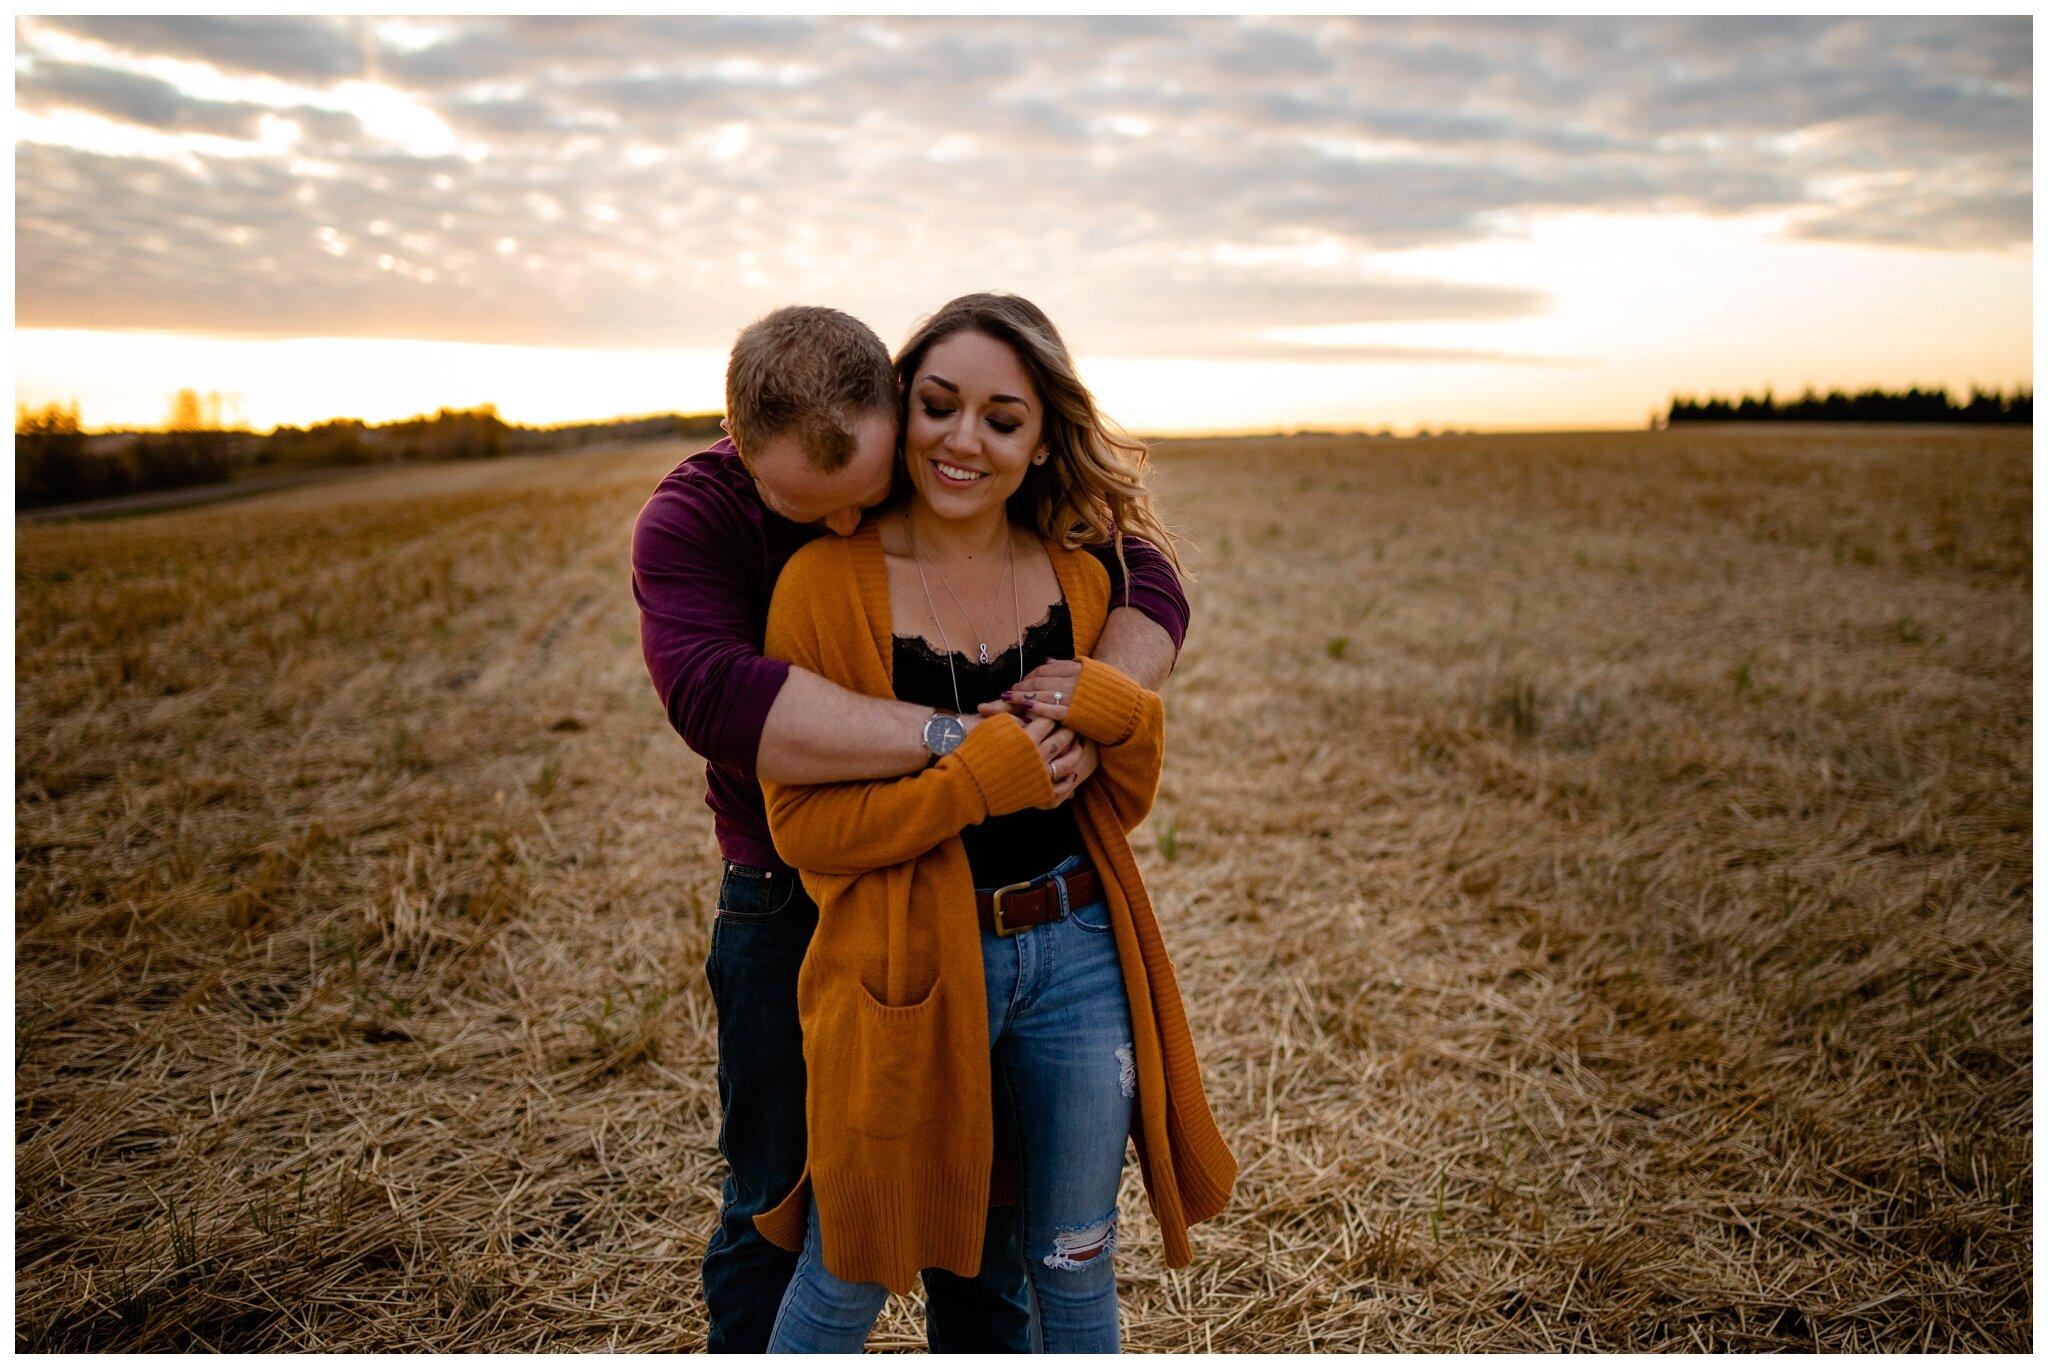 Edmonton Engagement Photographer Romantic Couples Photos Local YEG Strathcona County_0014.jpg